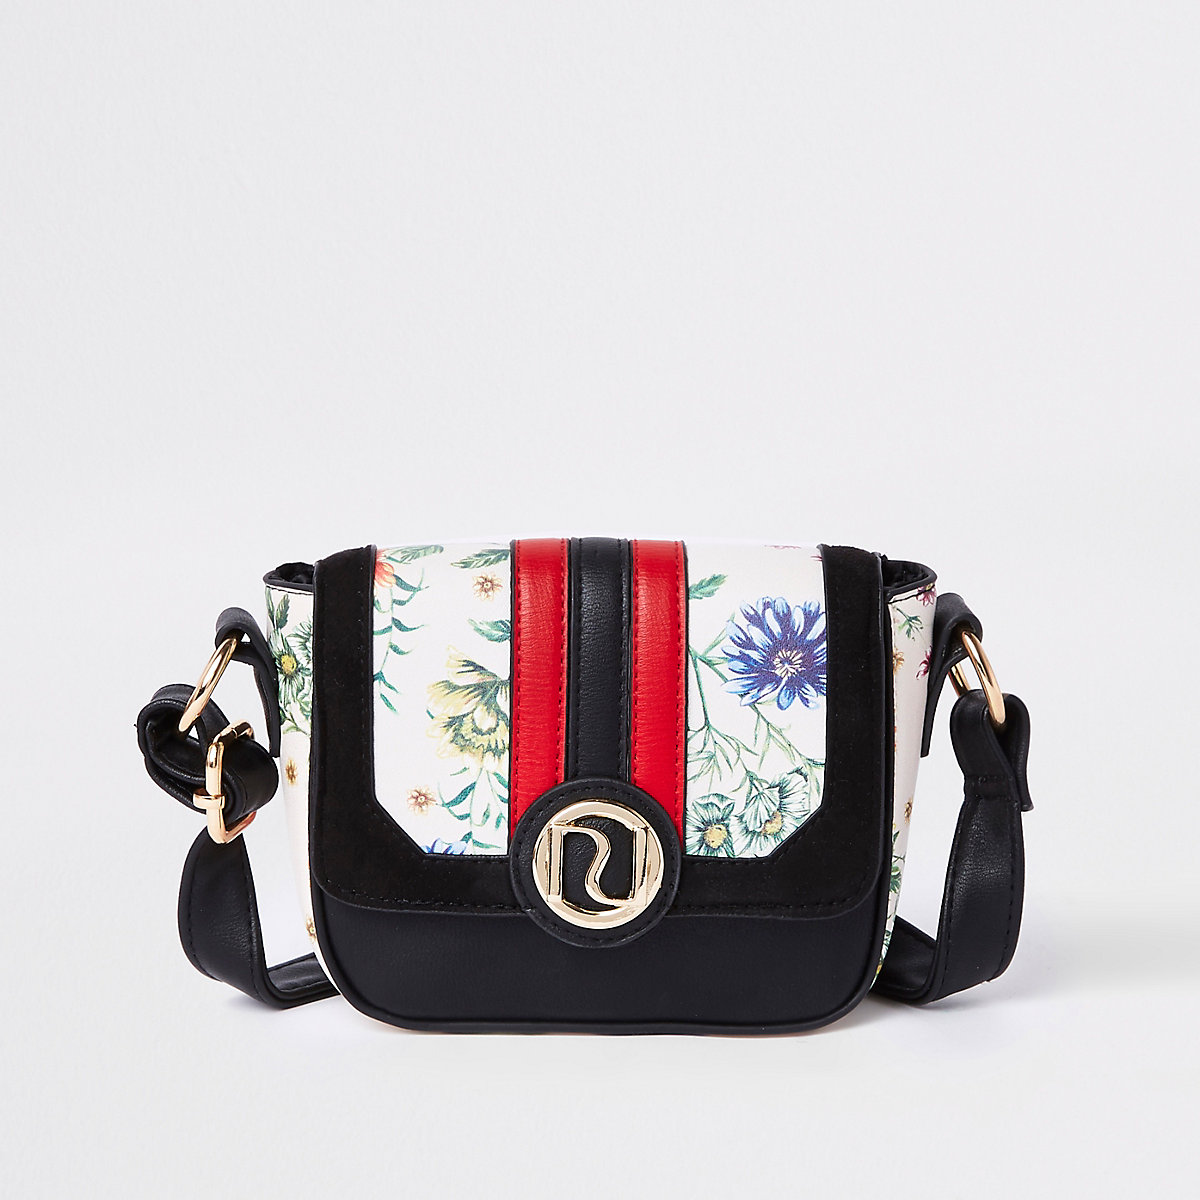 Girls black floral print cross body bag